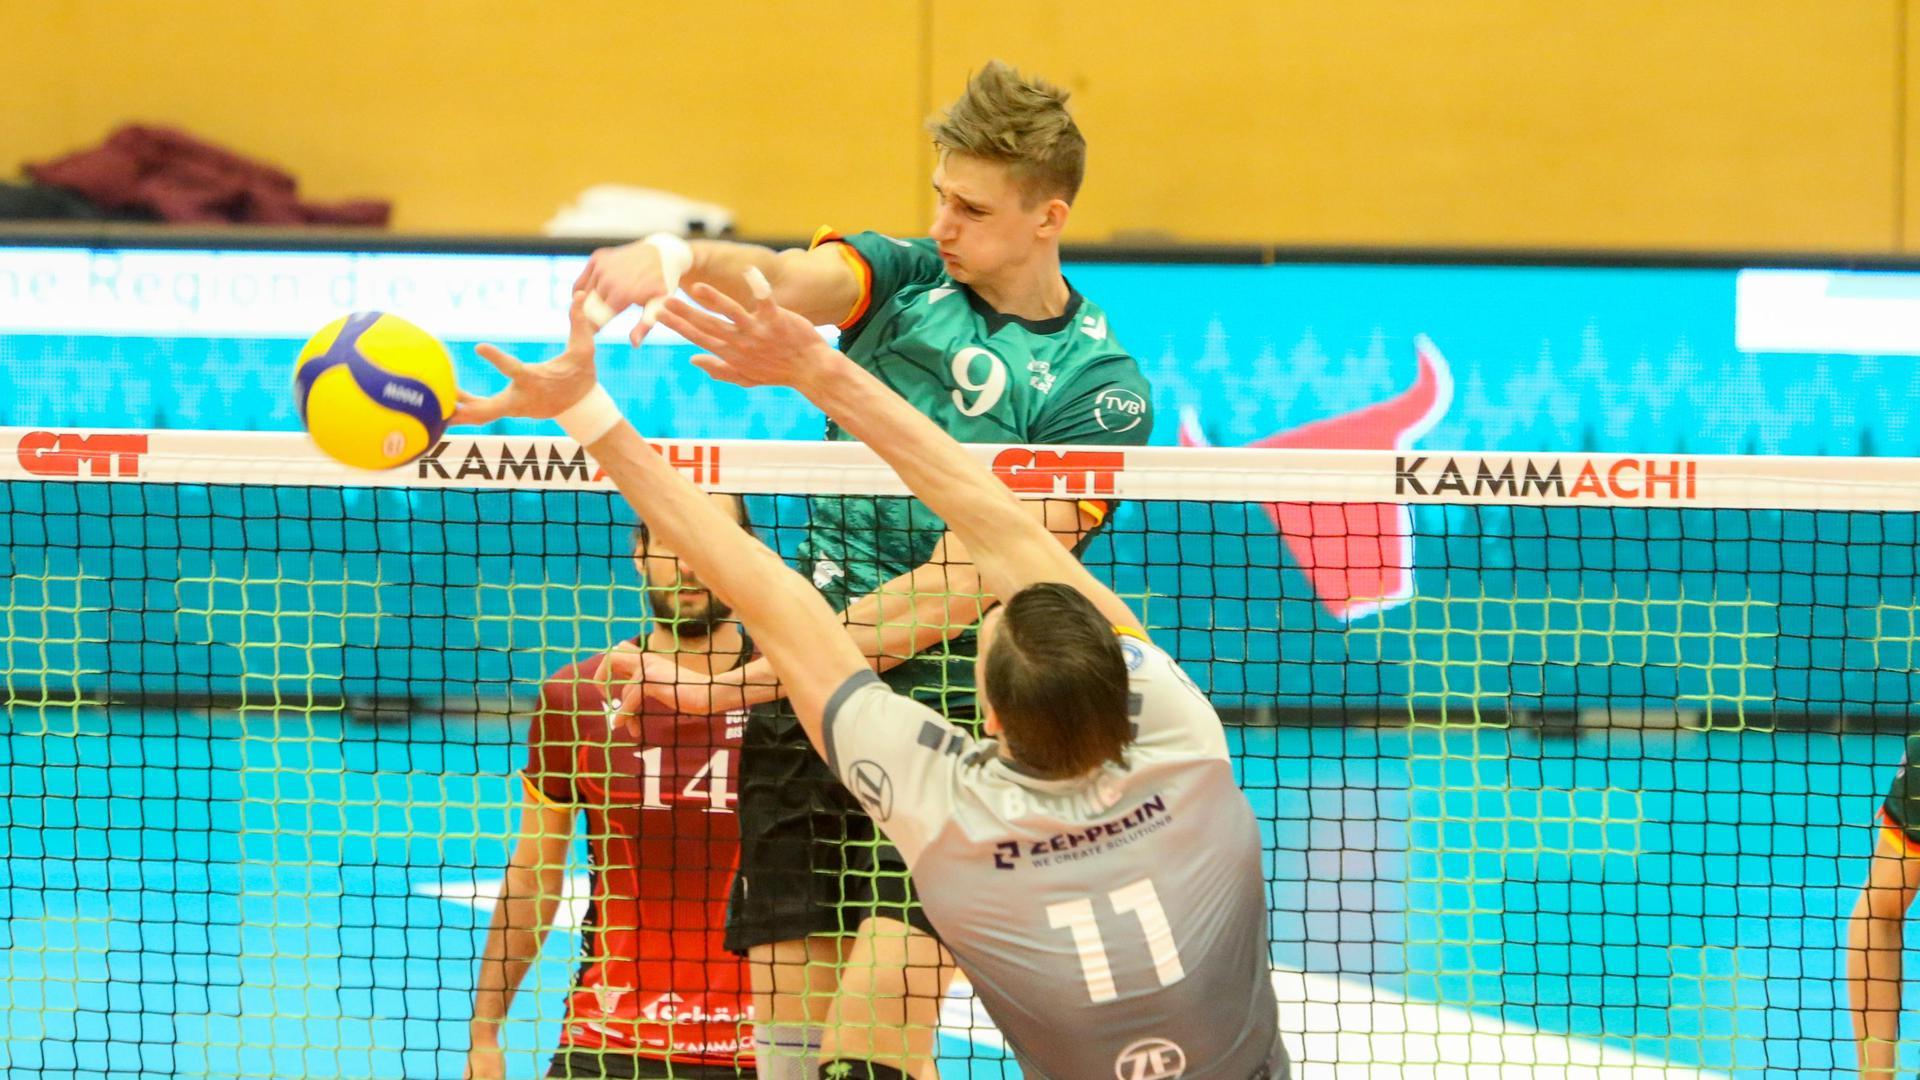 Volleyball TV Bühl Mathäus Jurkovics